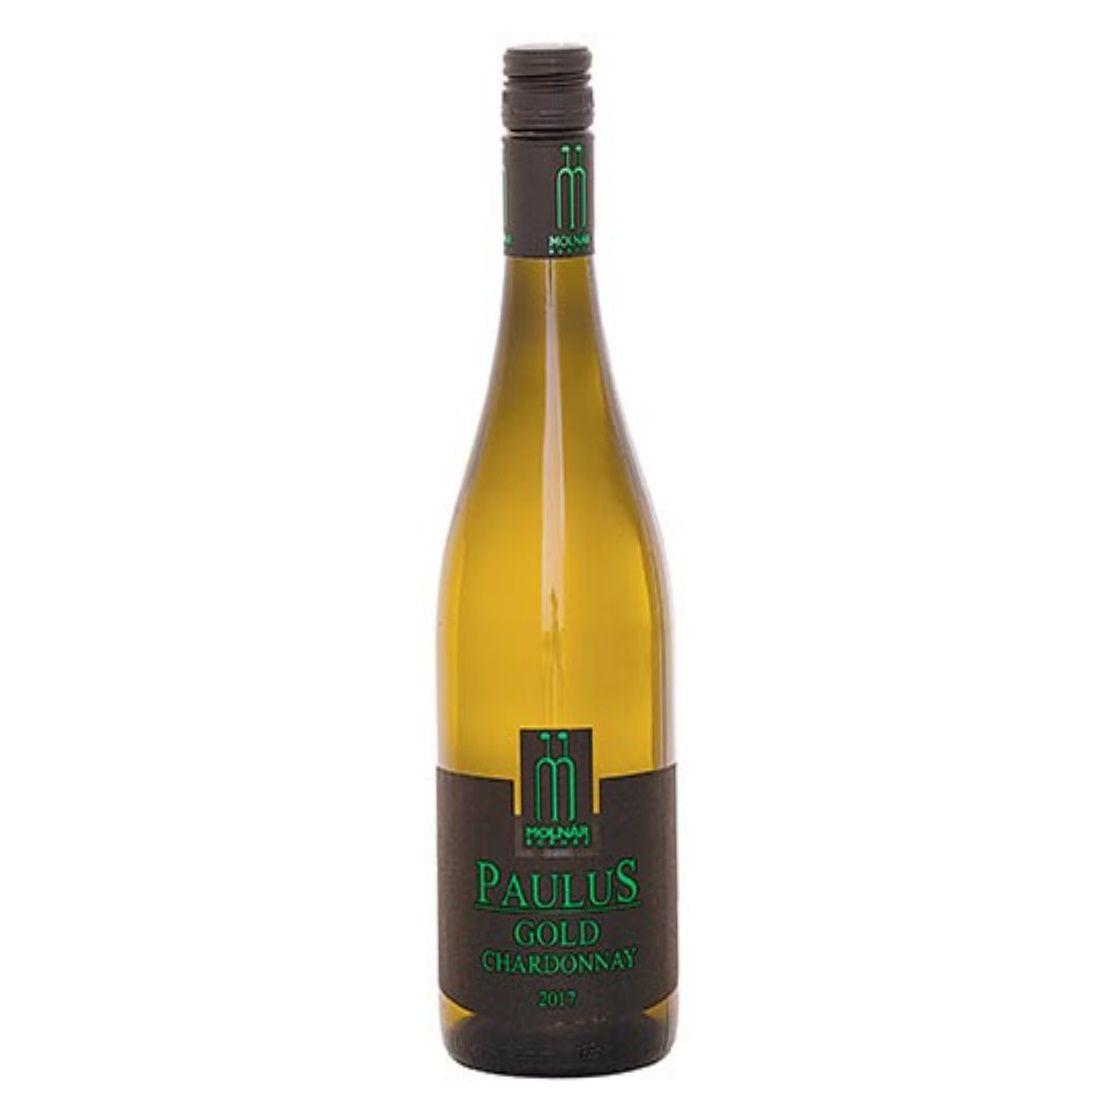 Paulus Gold Chardonnay 2020 0,75l